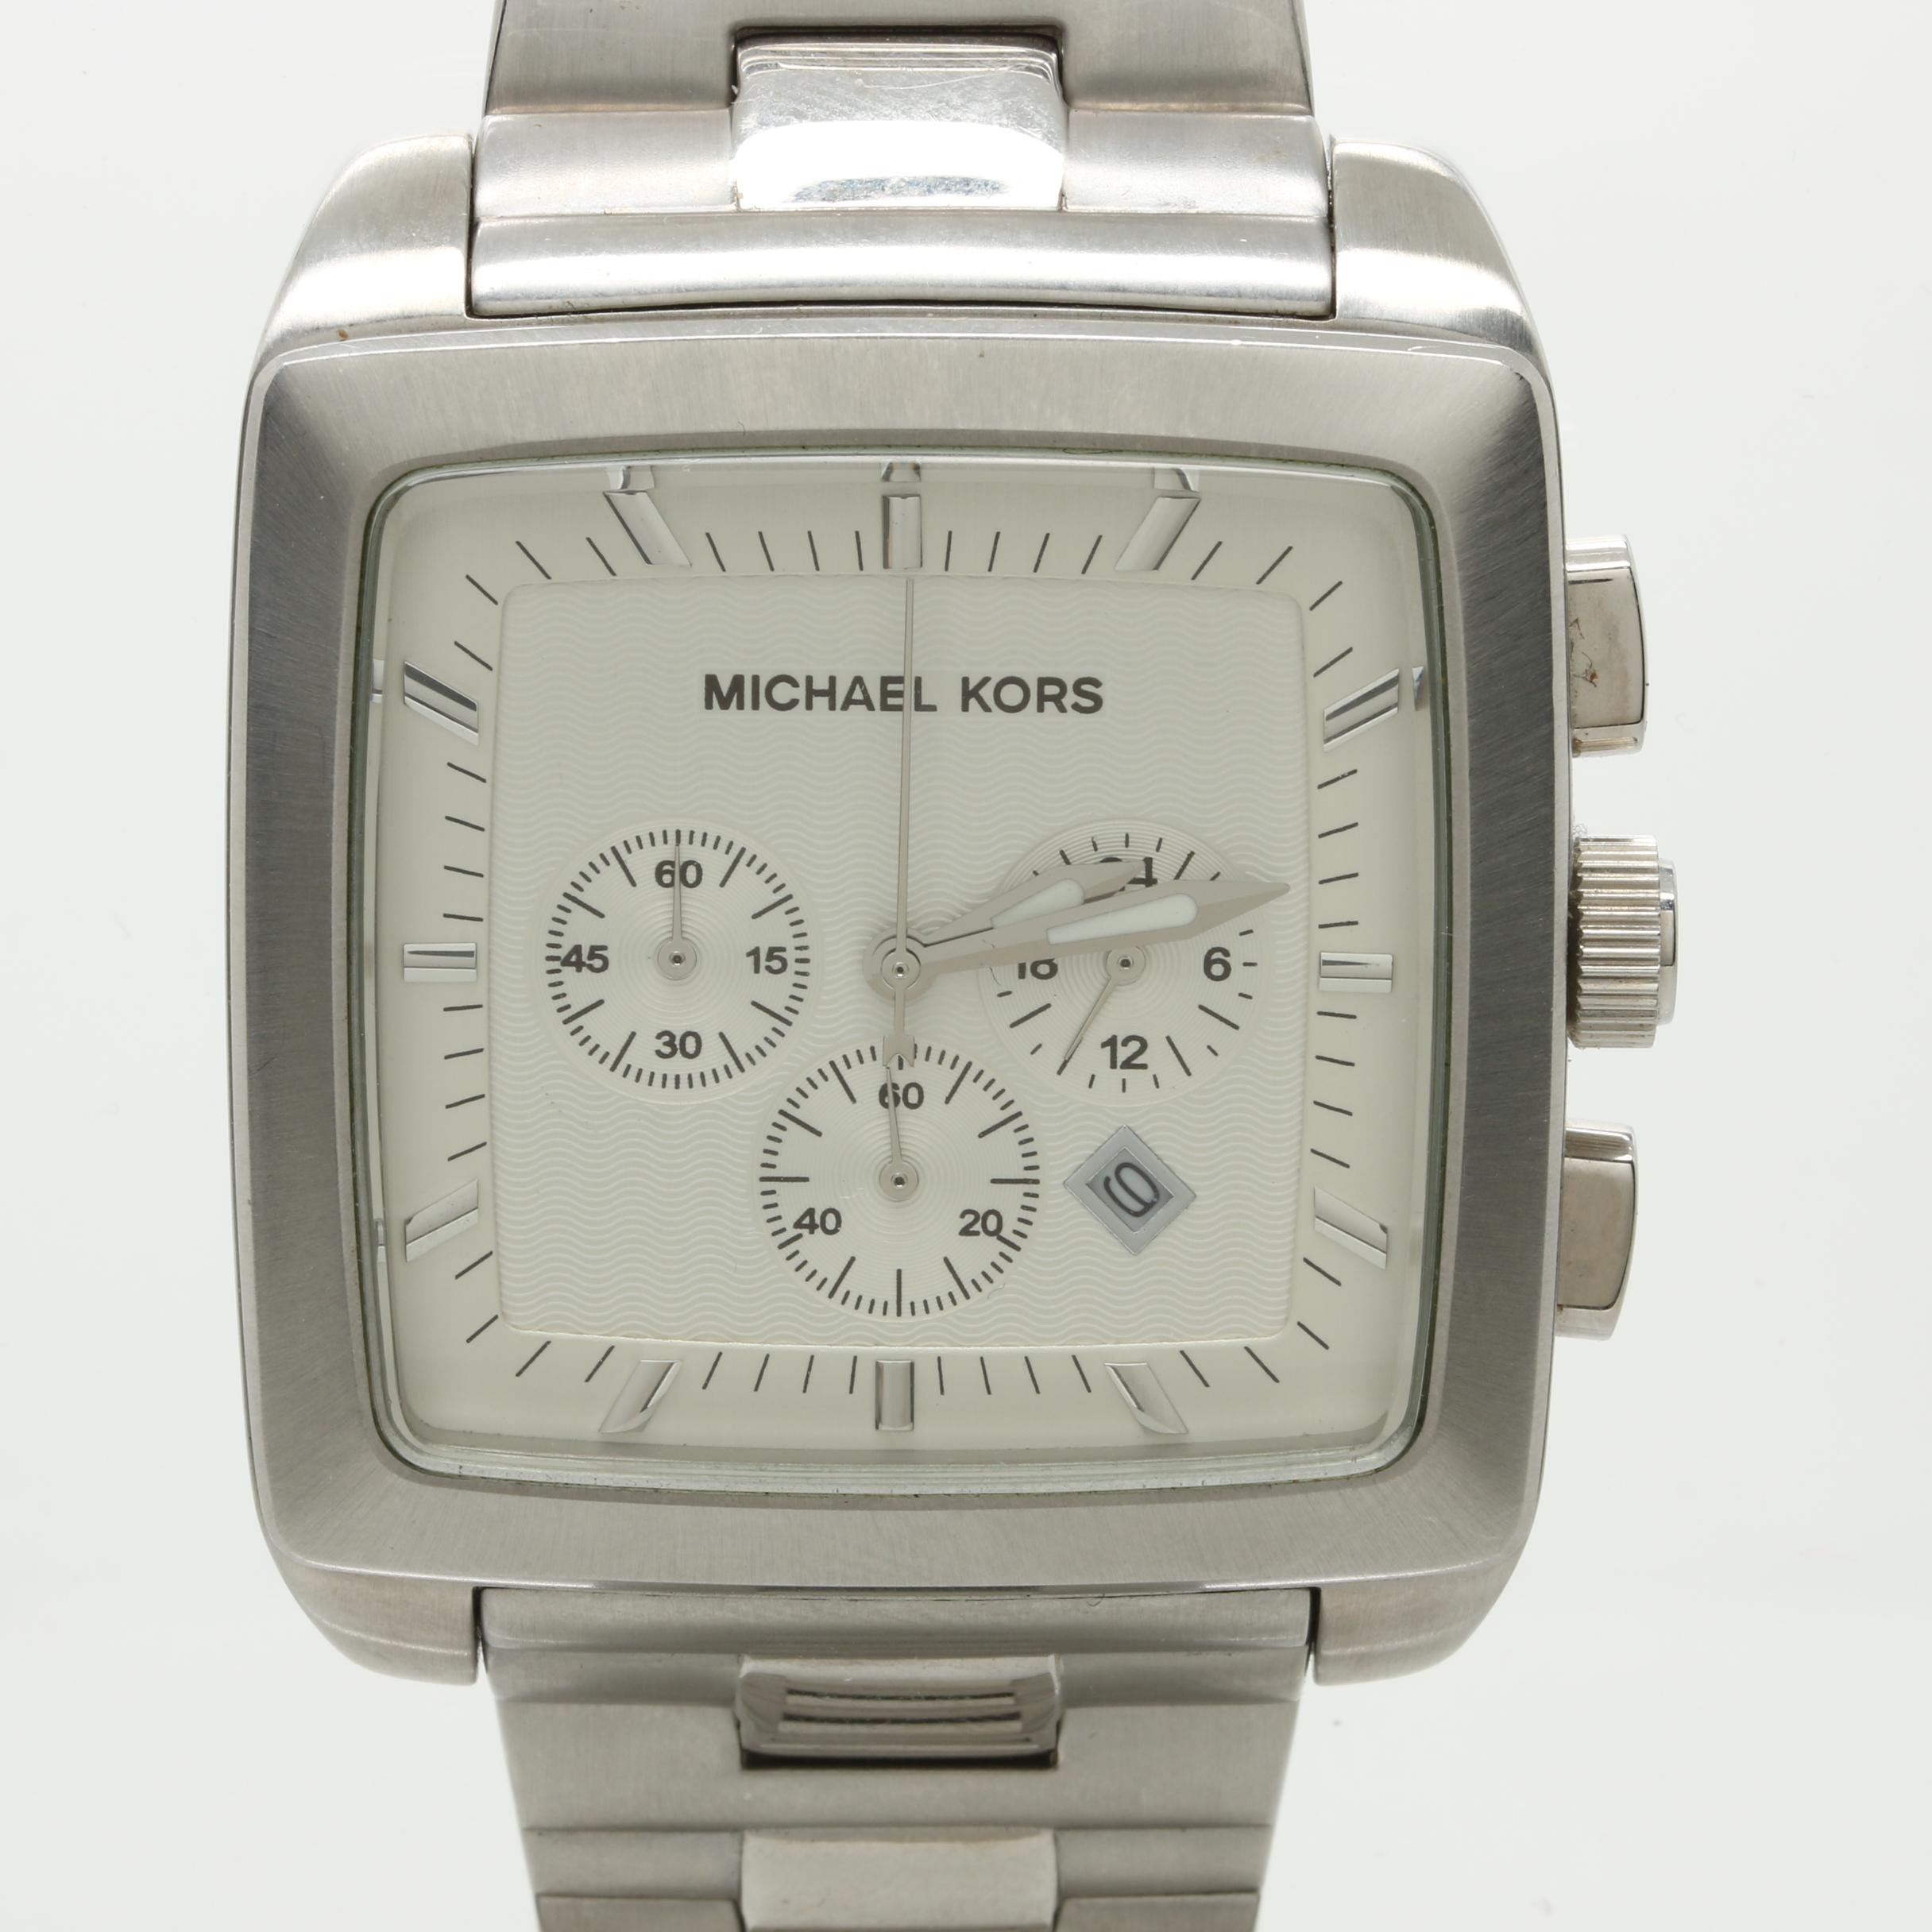 Michael Kors Stainless Steel Wristwatch